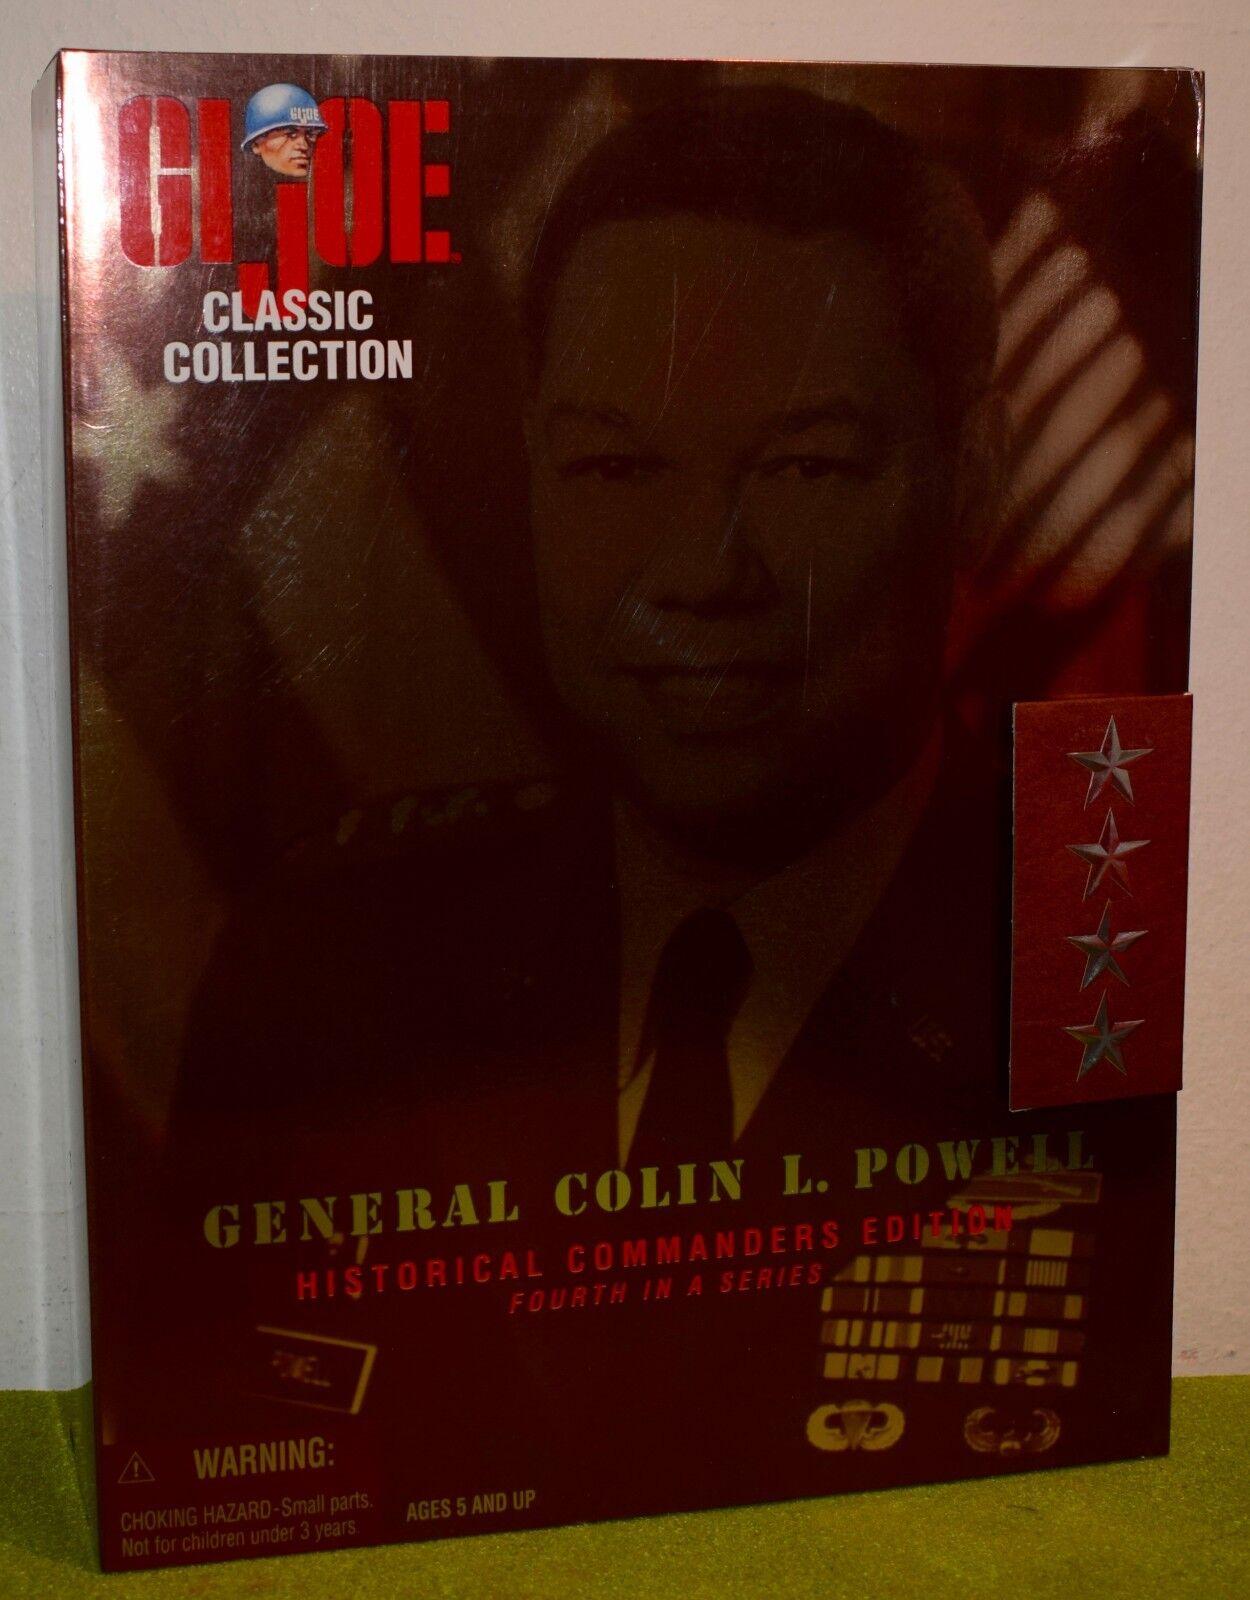 HASBRO GI JOE CLASSIC COLLECTION GENERAL COLIN L. POWELL